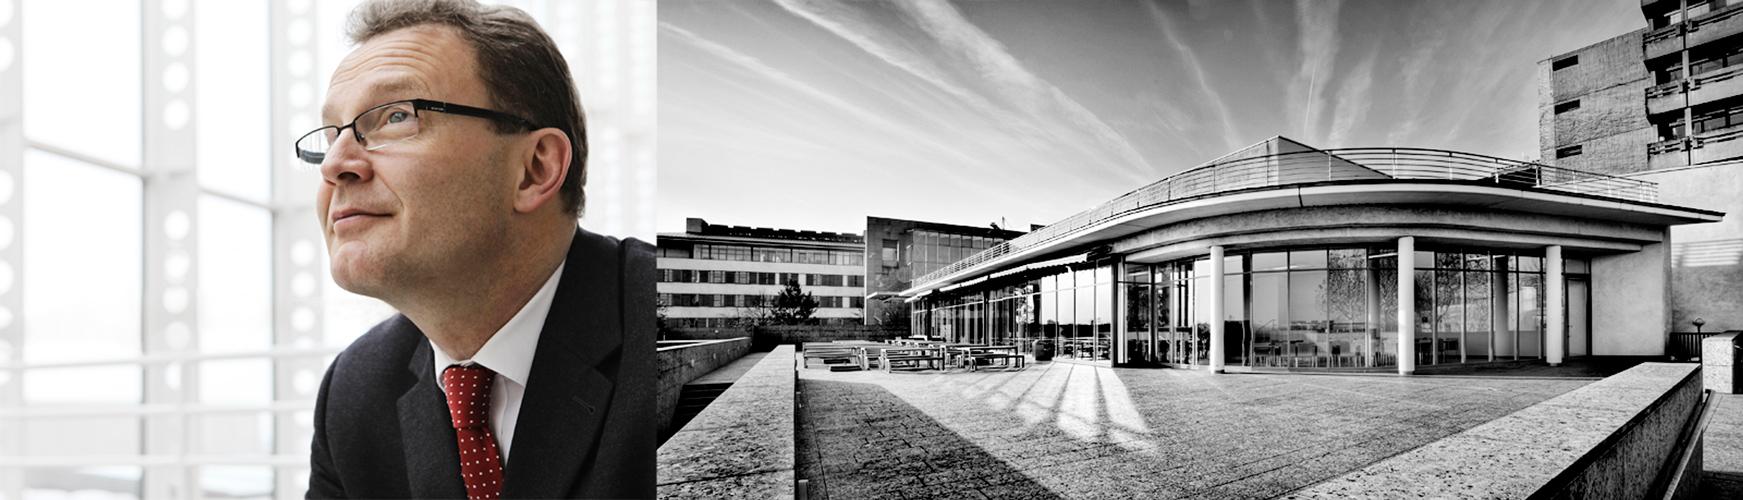 Universität-Frankfurt